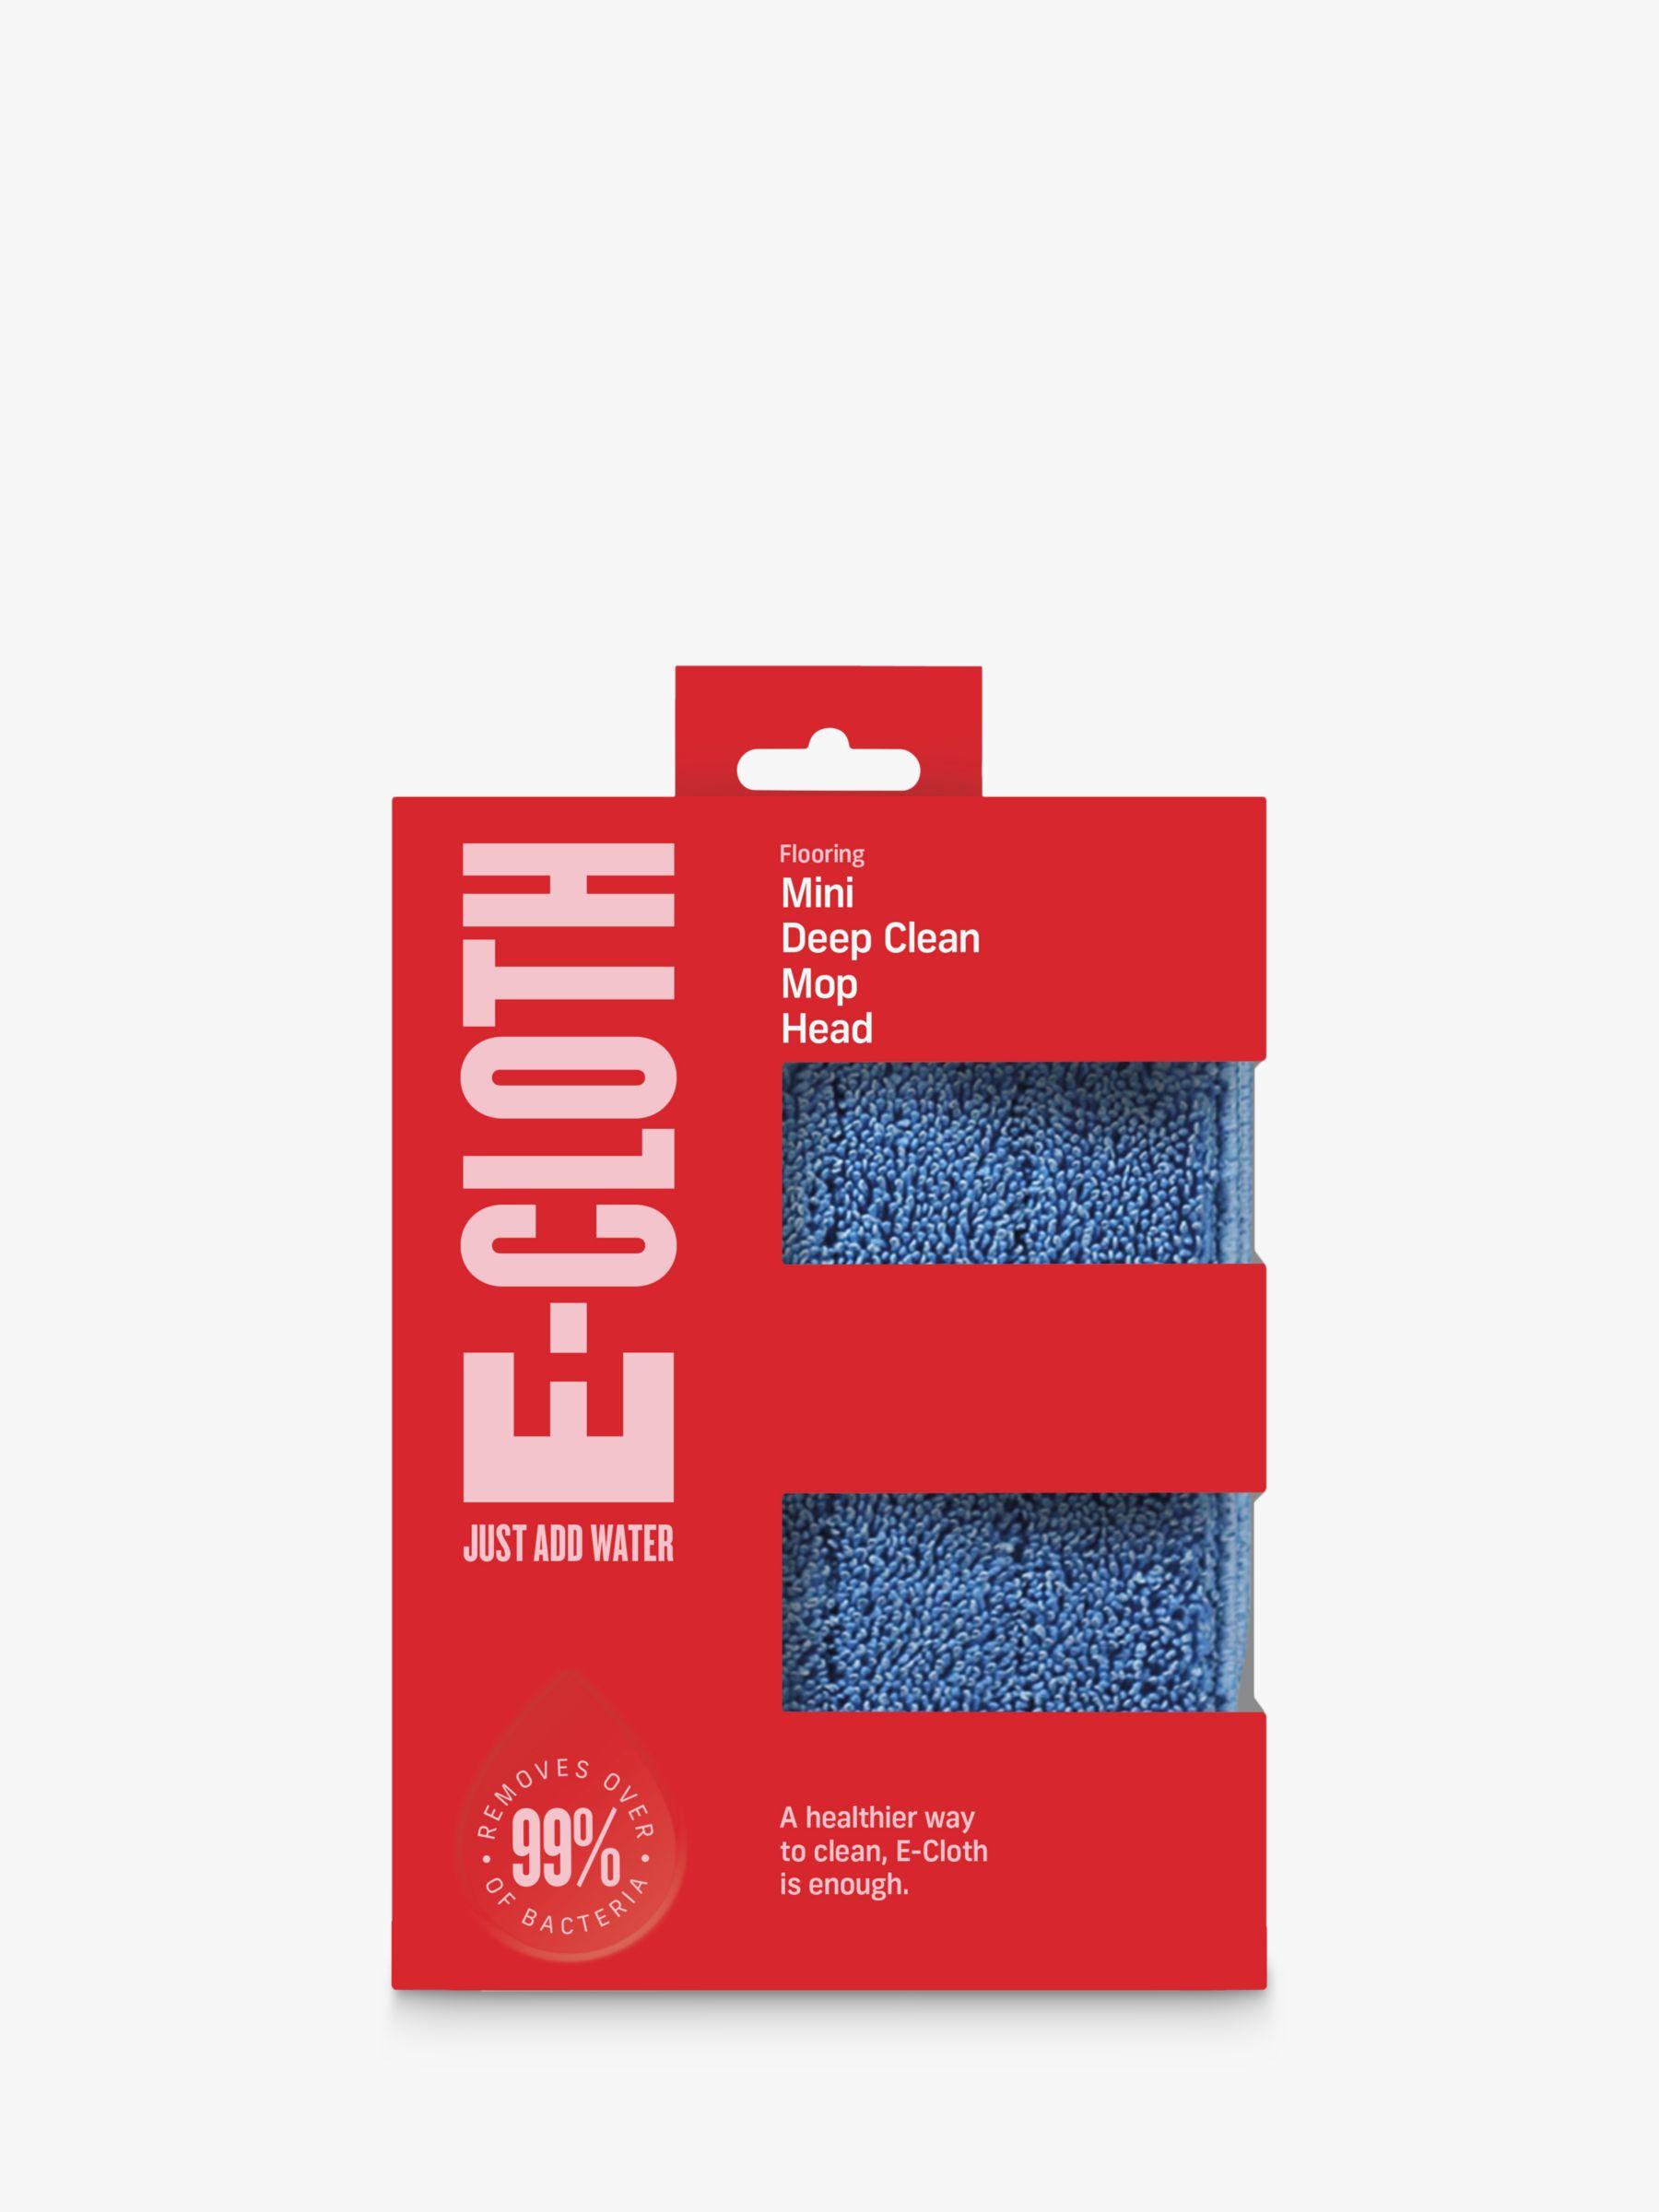 Enviroproducts e-cloth mini Mop Refill